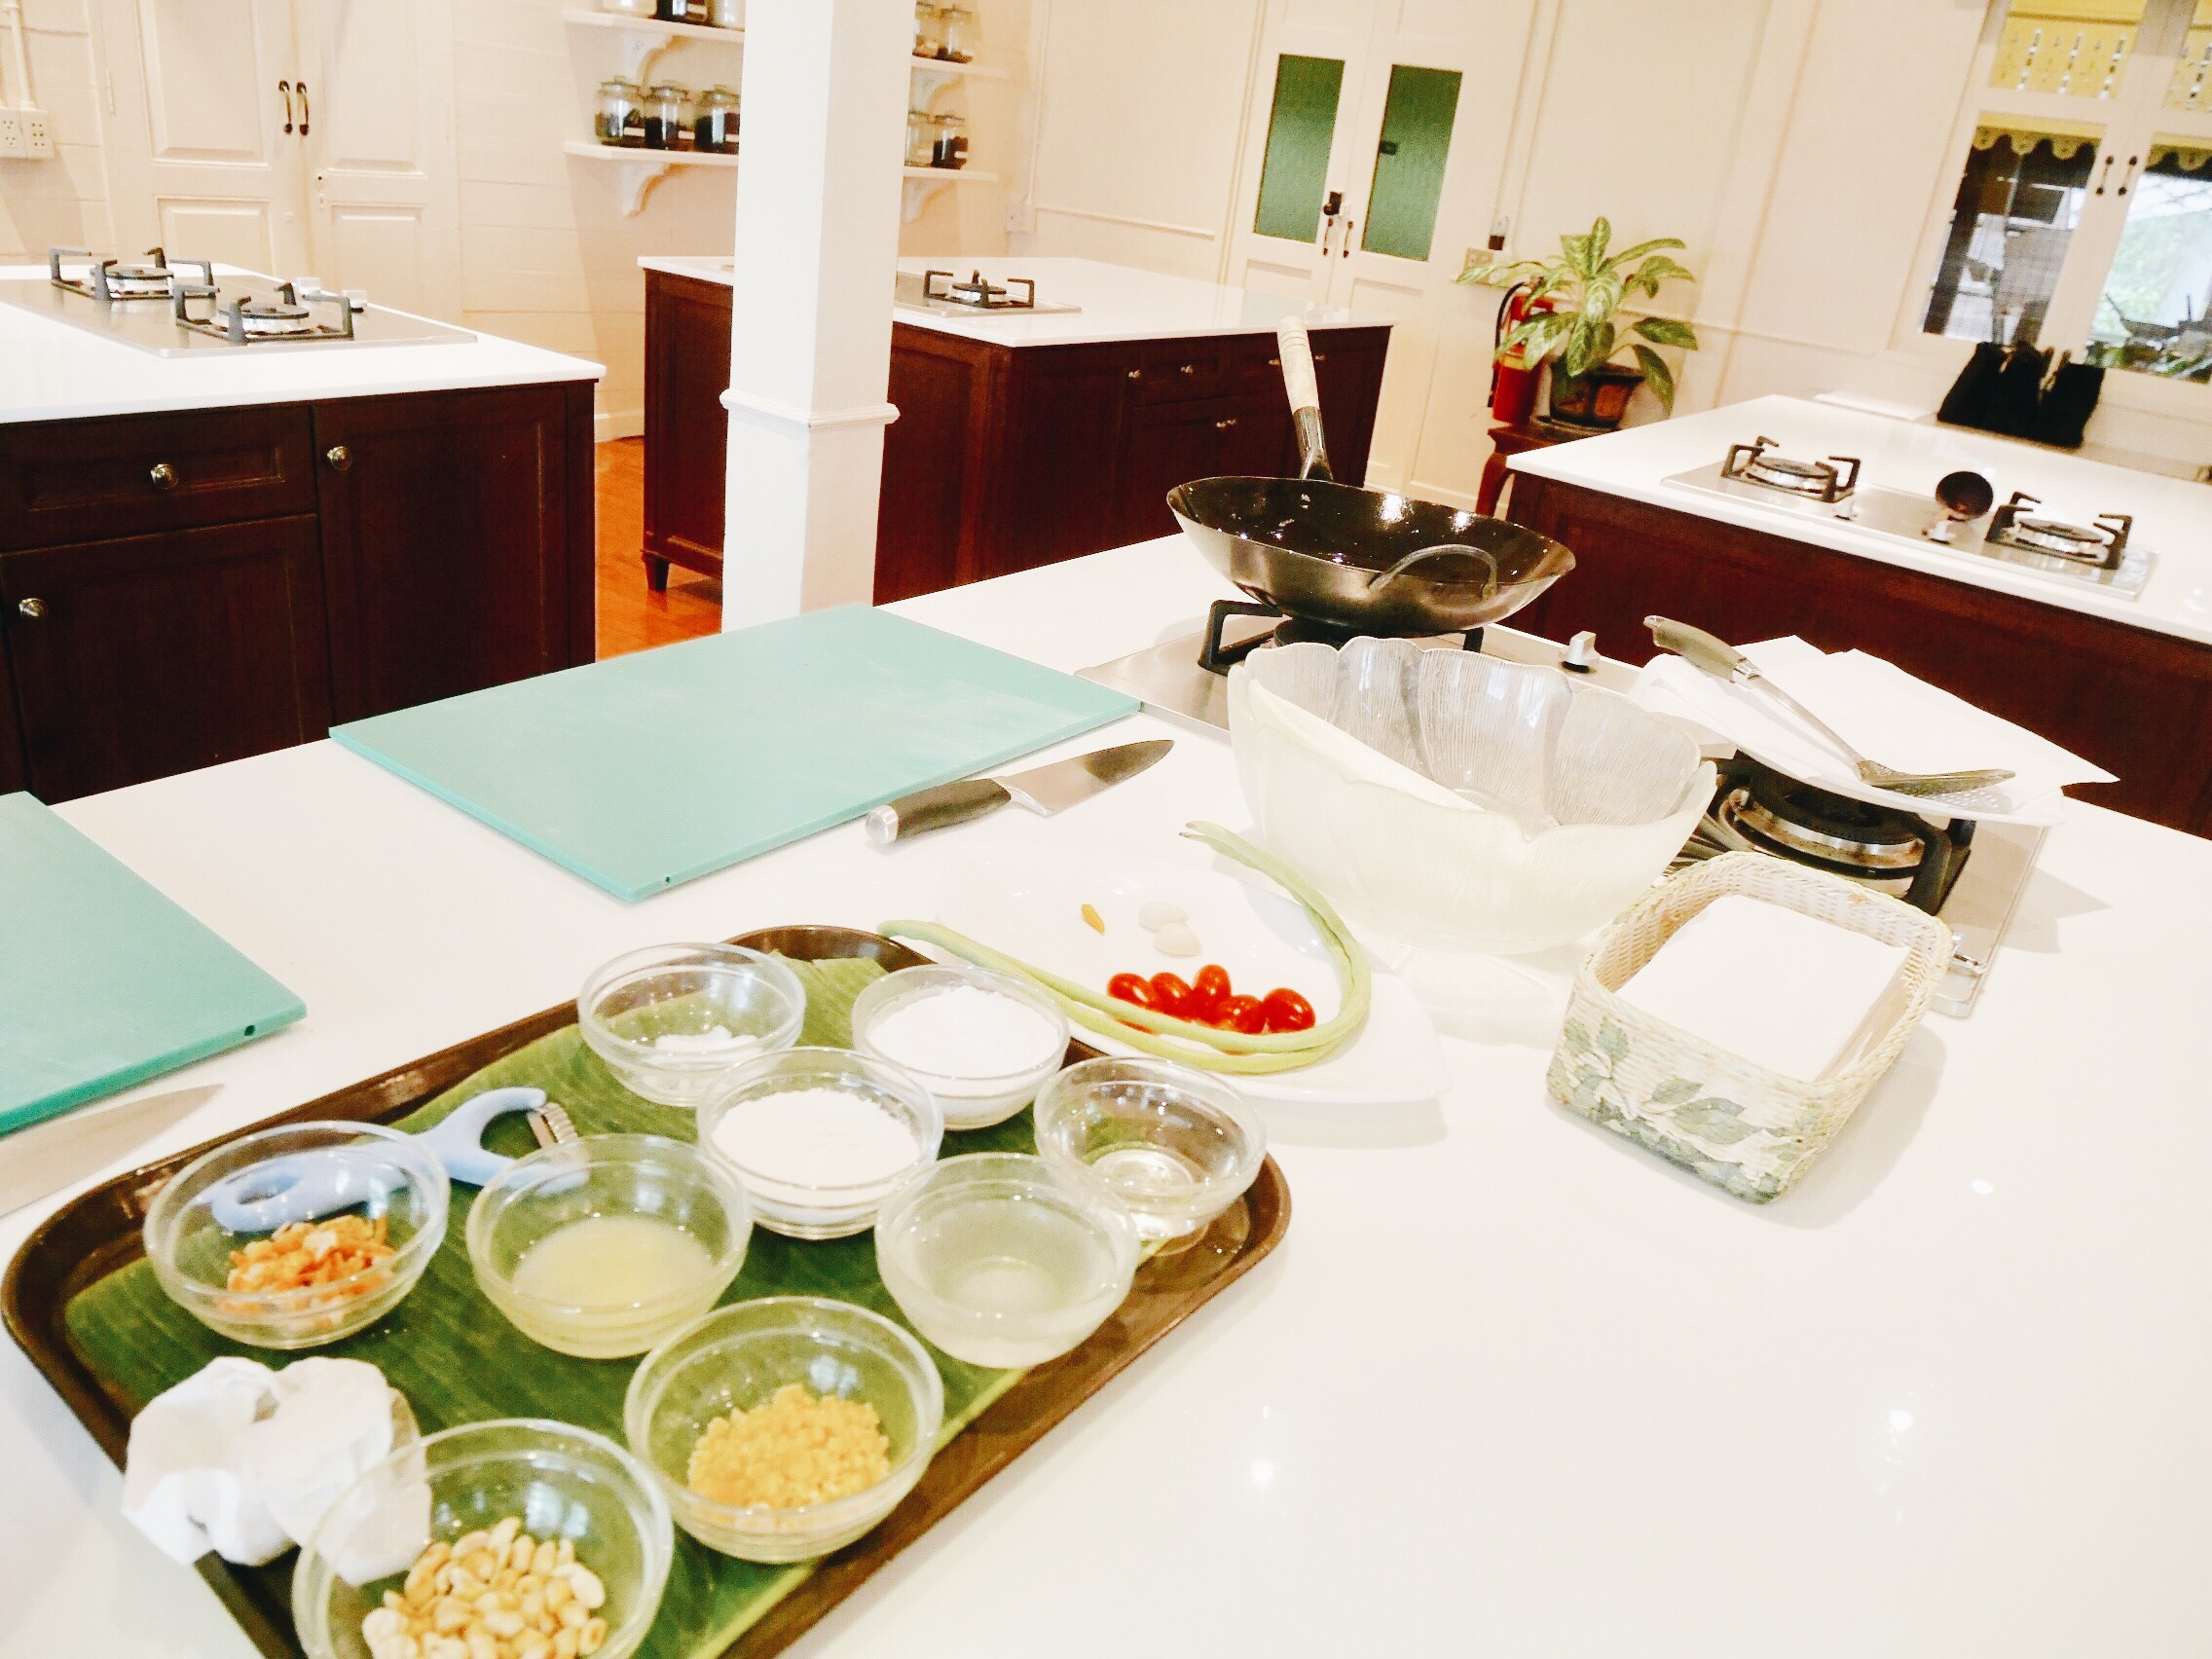 eeede91e d7a0 463b 8786 c69a48e94a72 - The Oriental Thai Cooking School - マンダリンオリエンタルバンコクのおもてなし空間で体験する絶品タイ料理教室